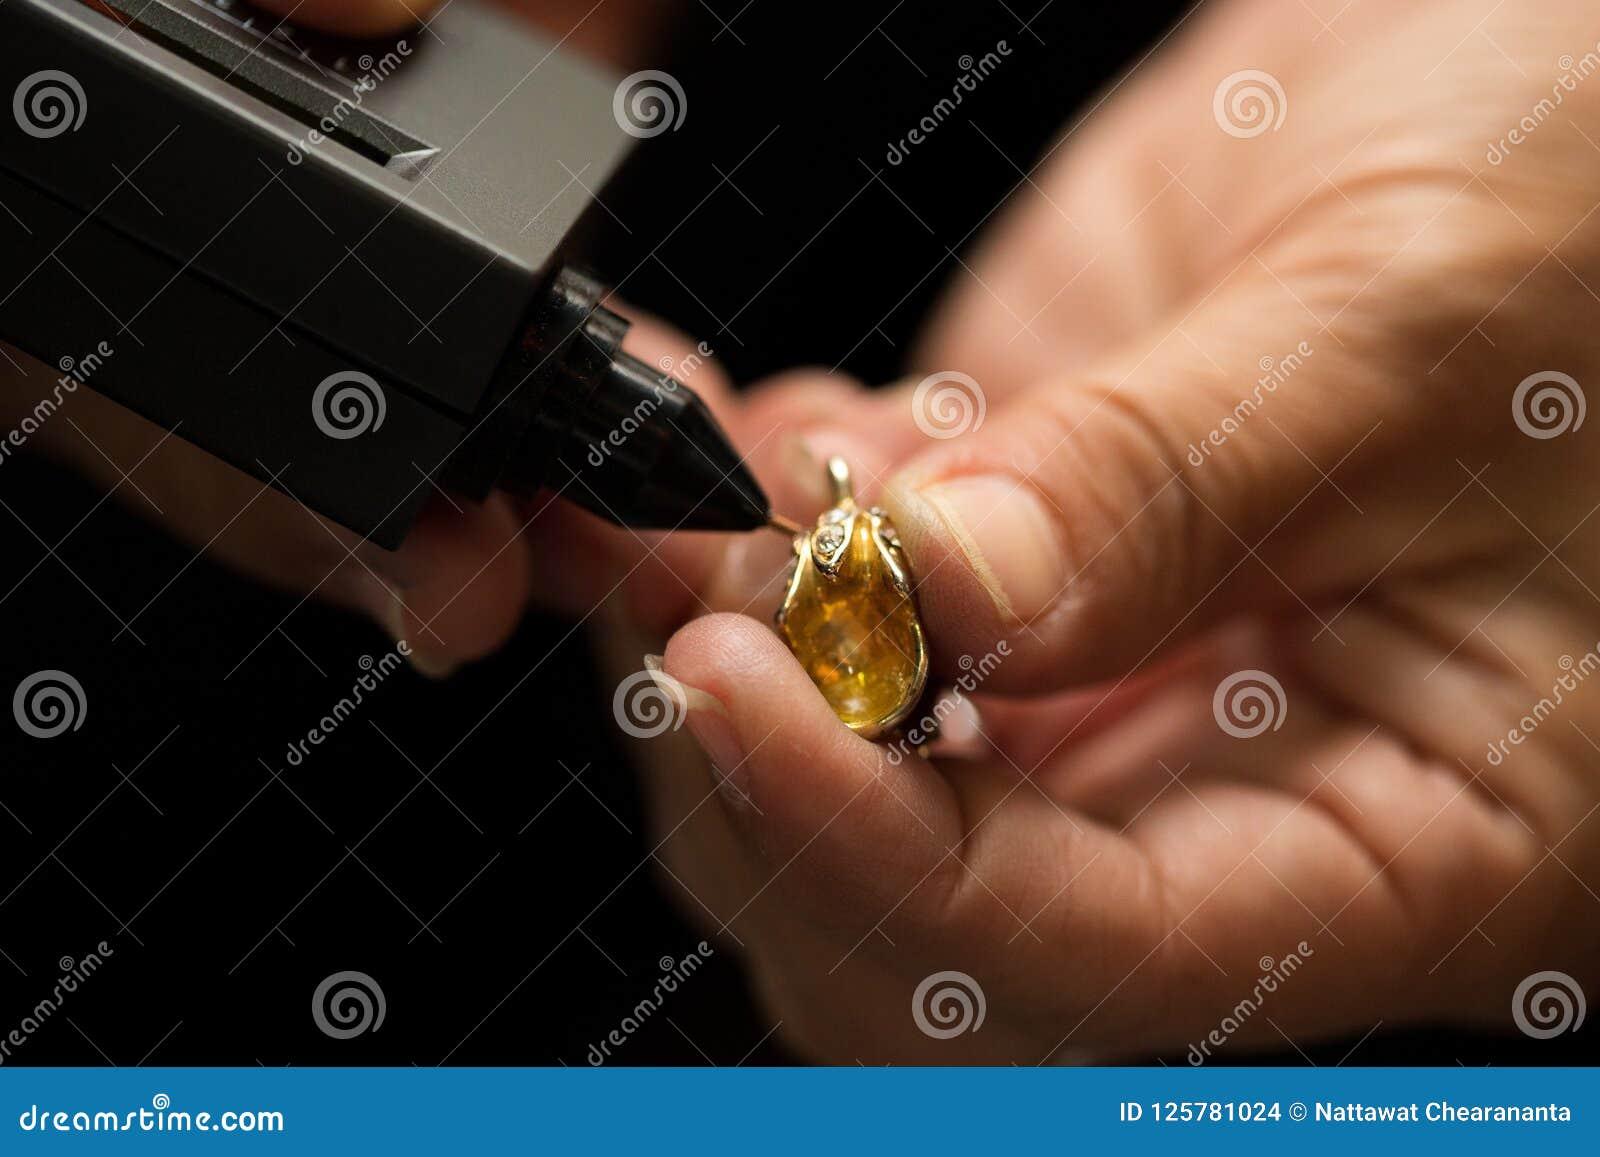 Indikator Diamond Tester Gemstone Selector Gems LED